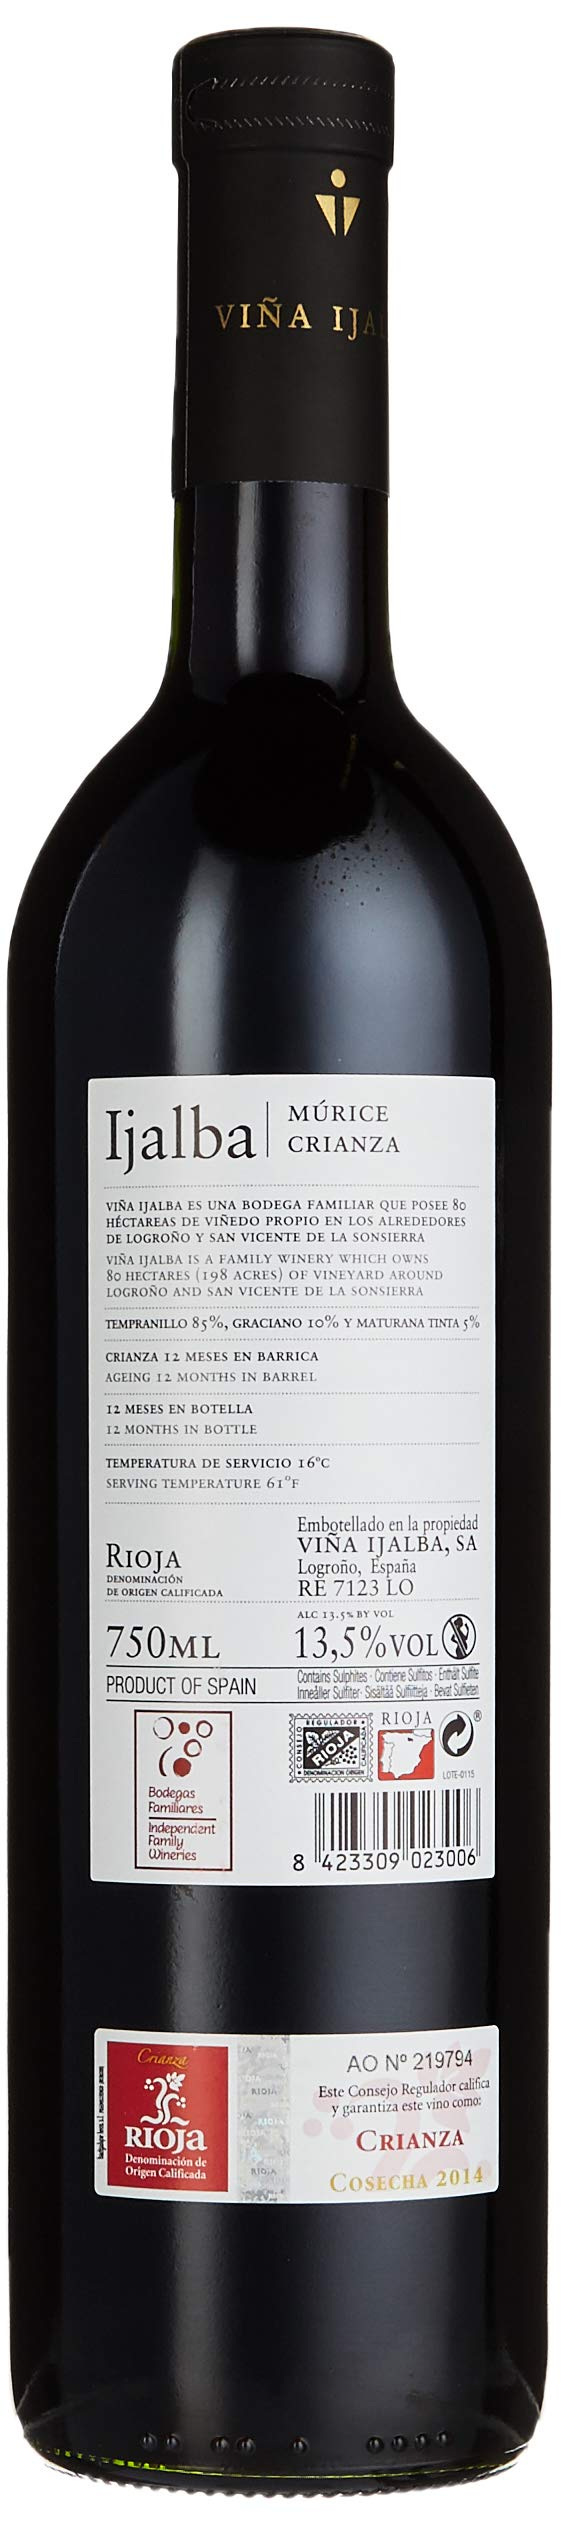 Ijalba-Murice-Crianza-Tempranillo-20142015-trocken-6-x-075-l